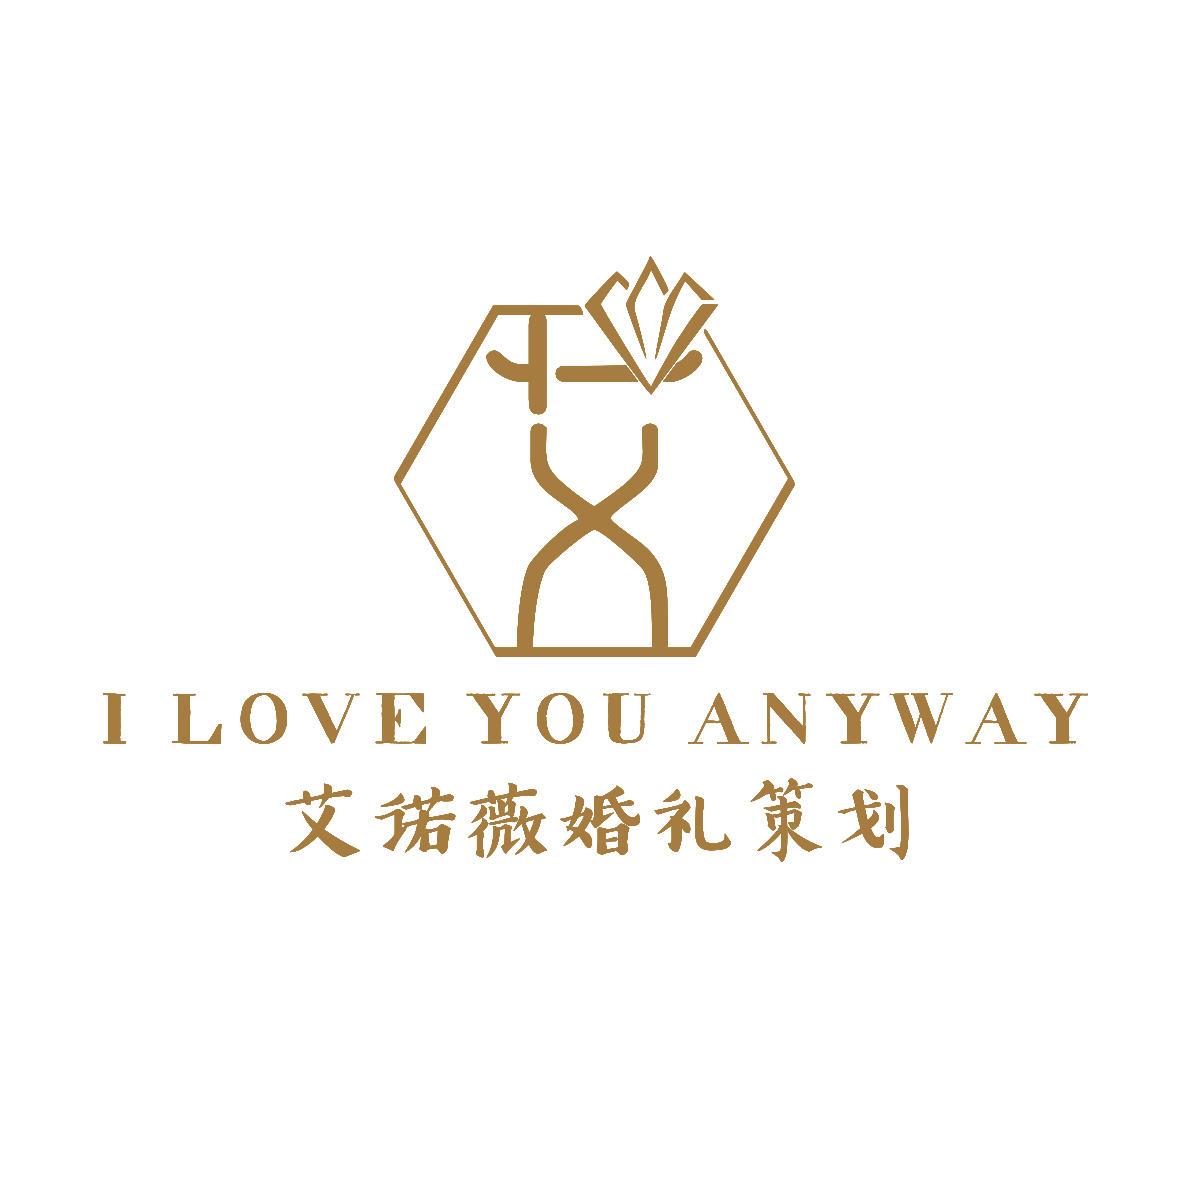 Anyway艾诺薇下载app领彩金37